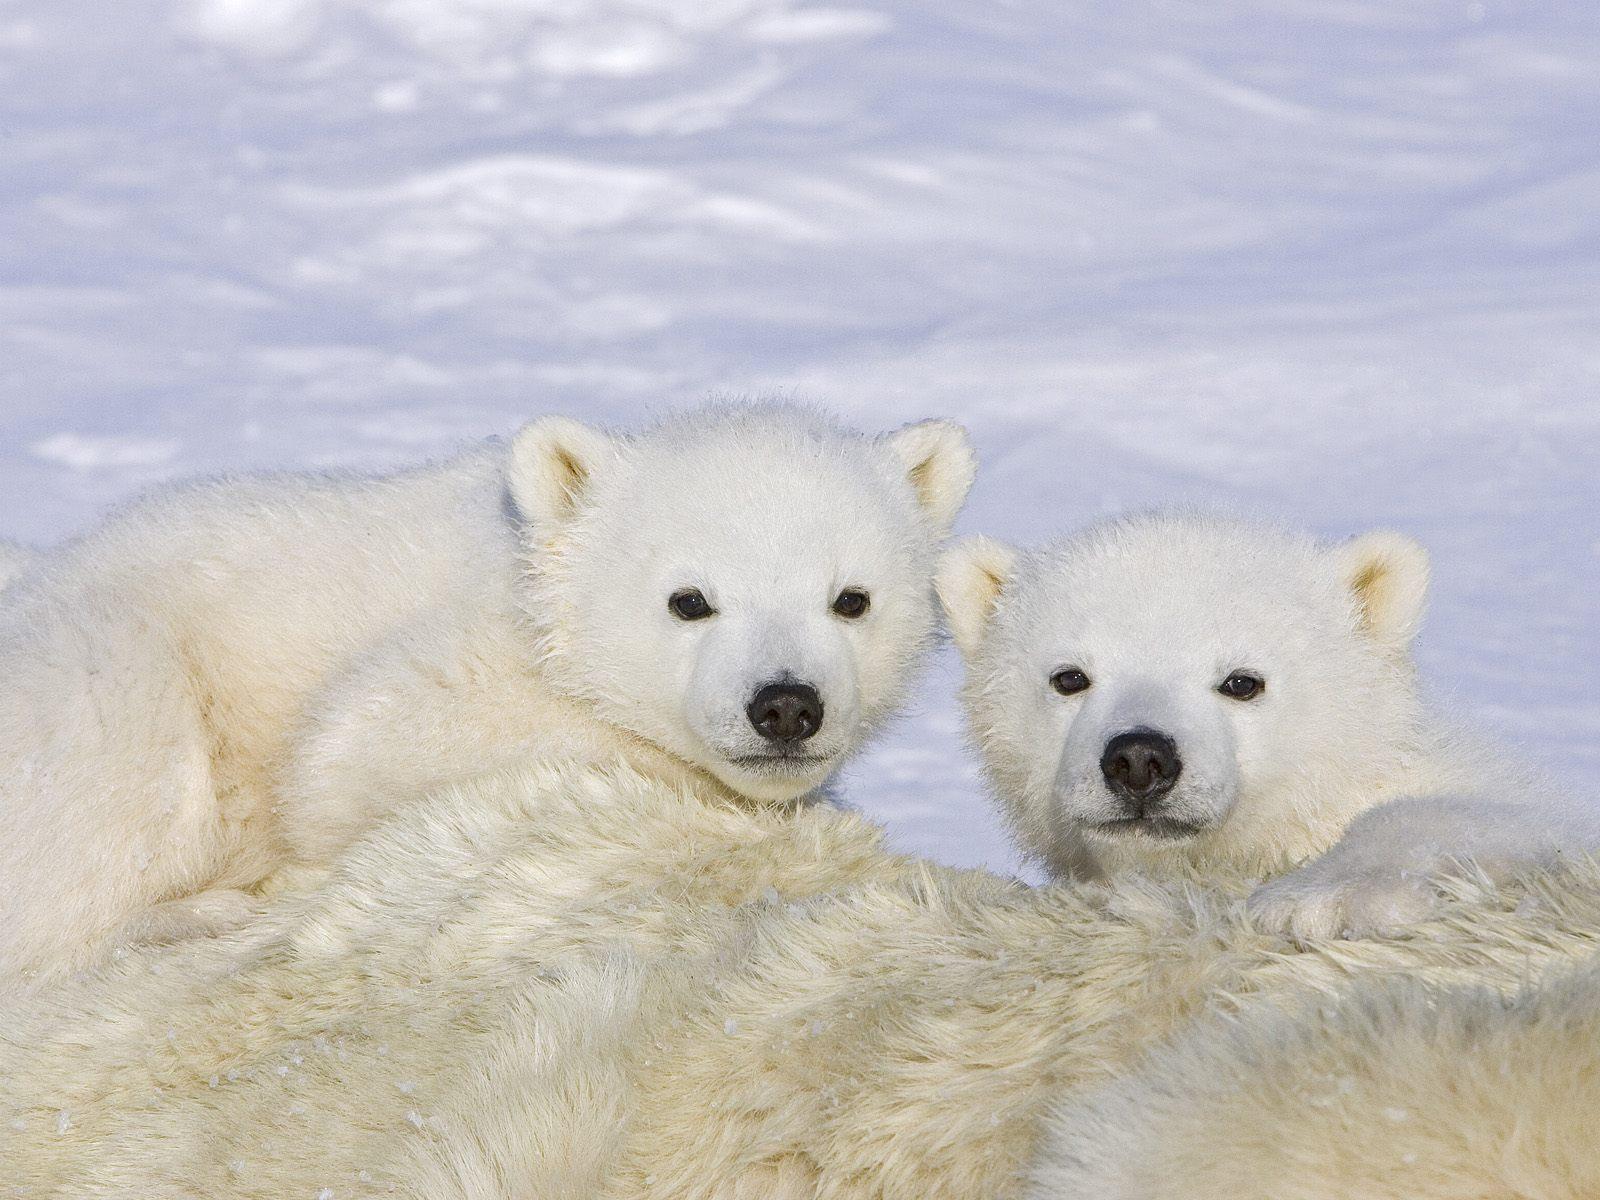 JONAH WOLF: Cute Polar Bear Babies Cuddling in the snow!